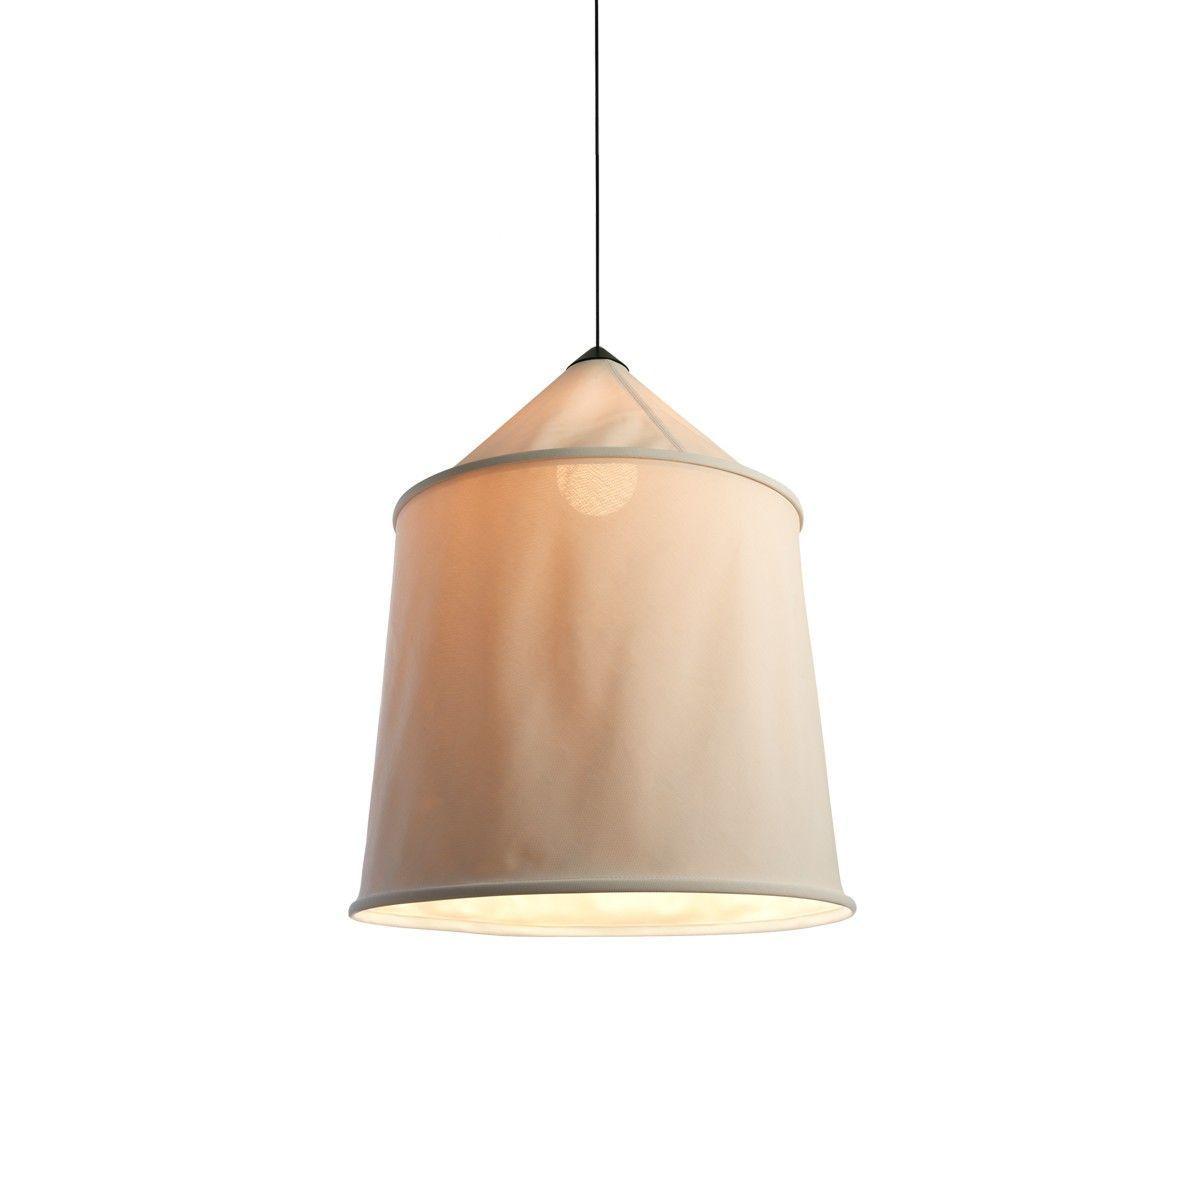 Led Pendelleuchte Rund Höhenverstellbar Pendelleuchten Glas Weiss Pendelleuchten Wohnzimmerlampen Pendelleuchte Esstis Pendant Light Light Ceiling Lights